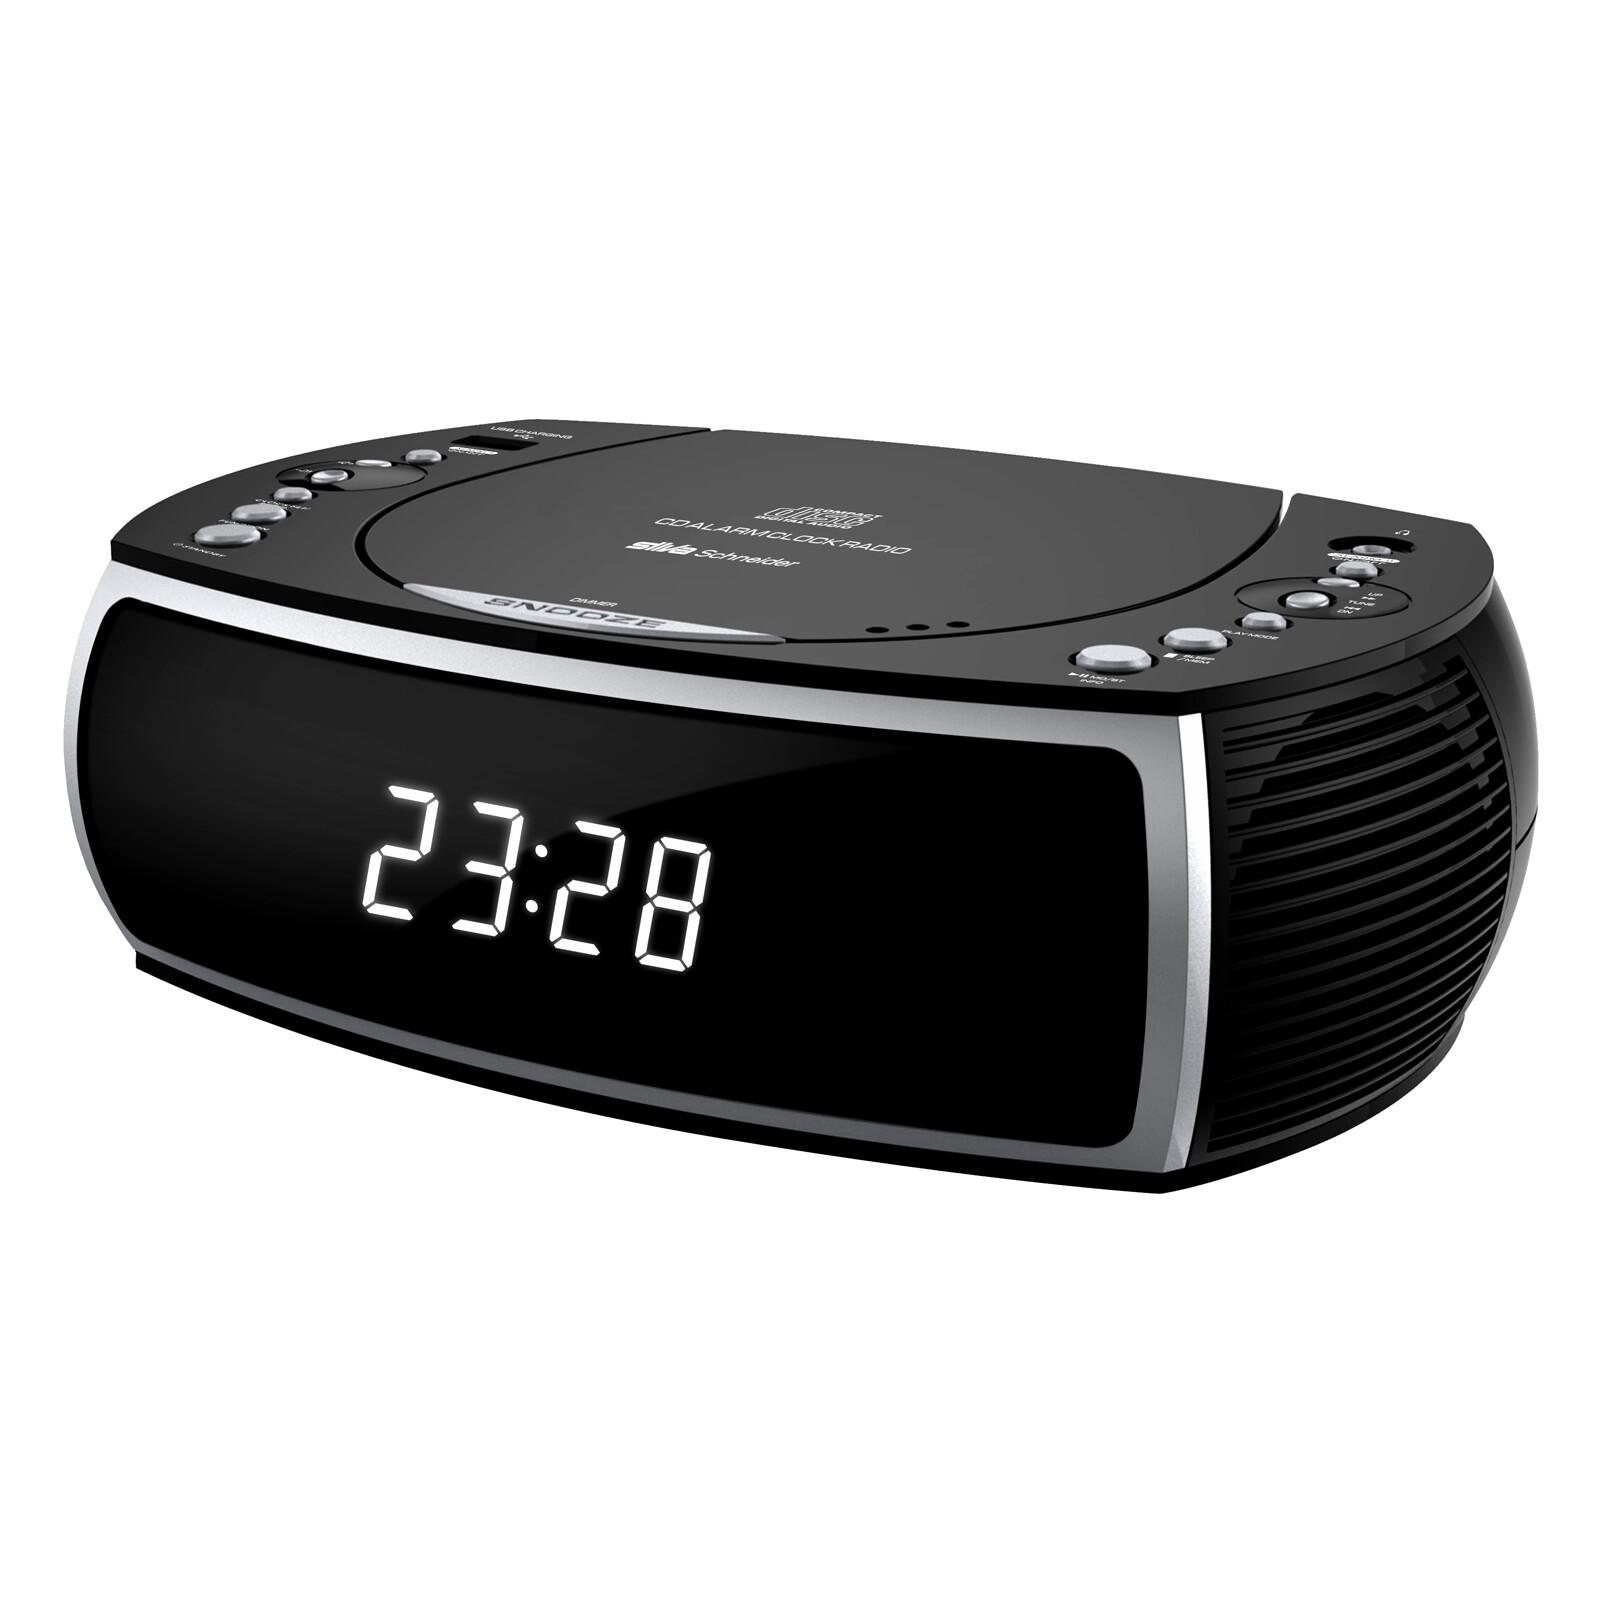 Silva CCD 16 Uhrenradio USB Schwarz